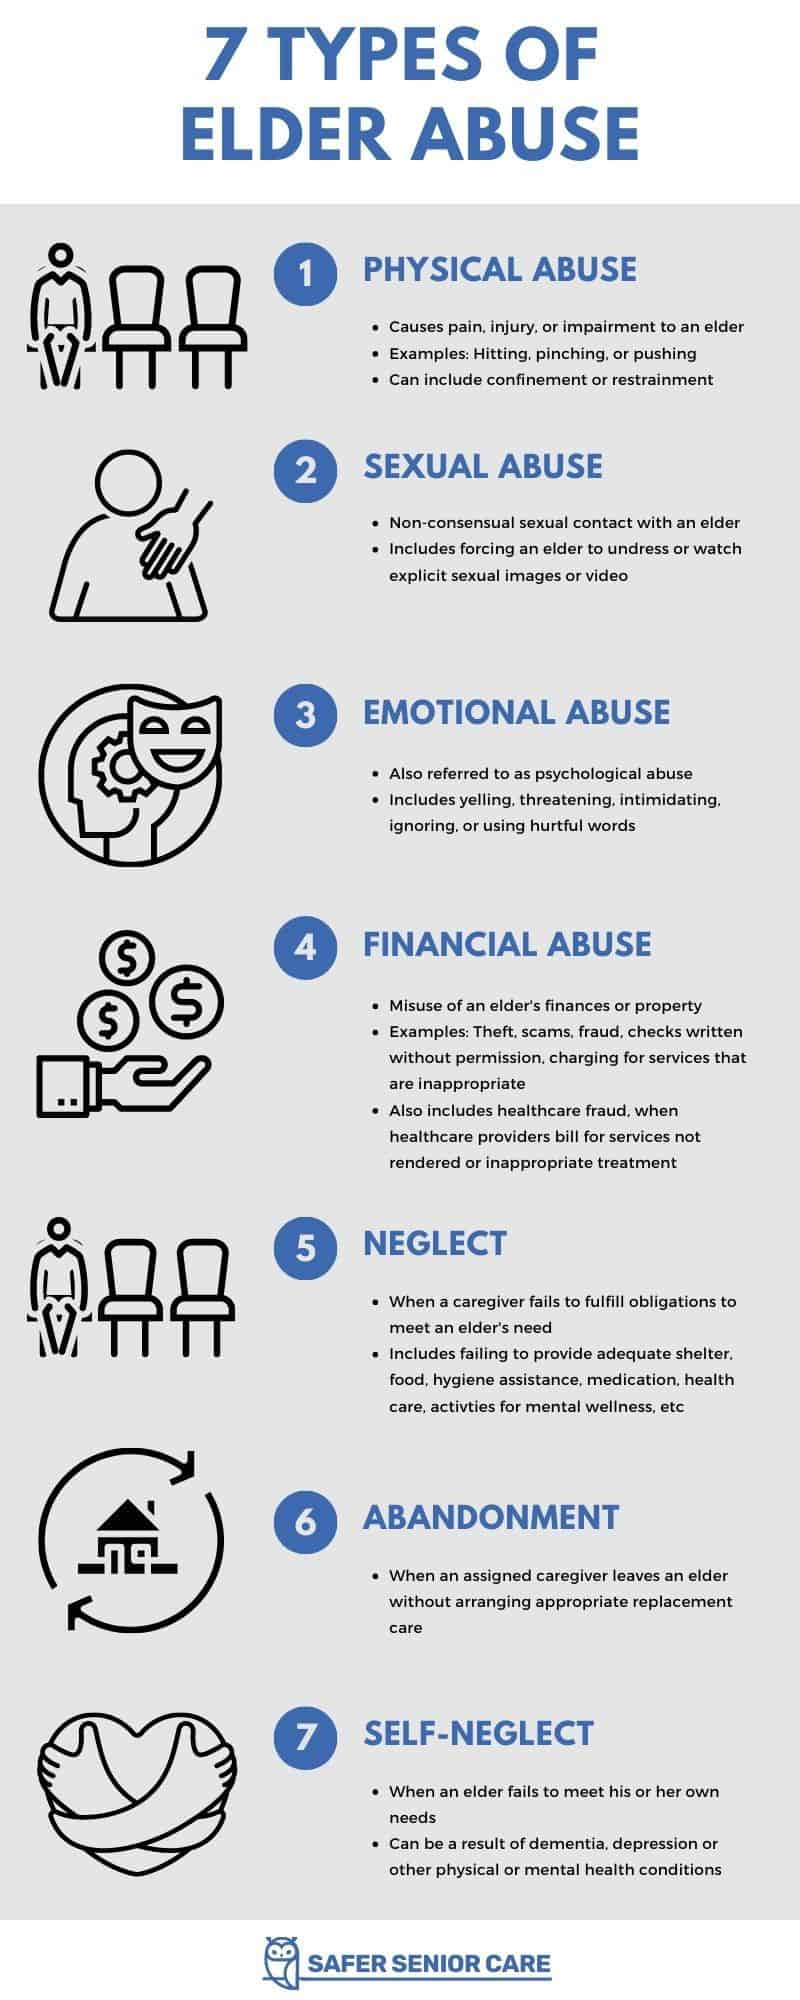 7 types of elder abuse